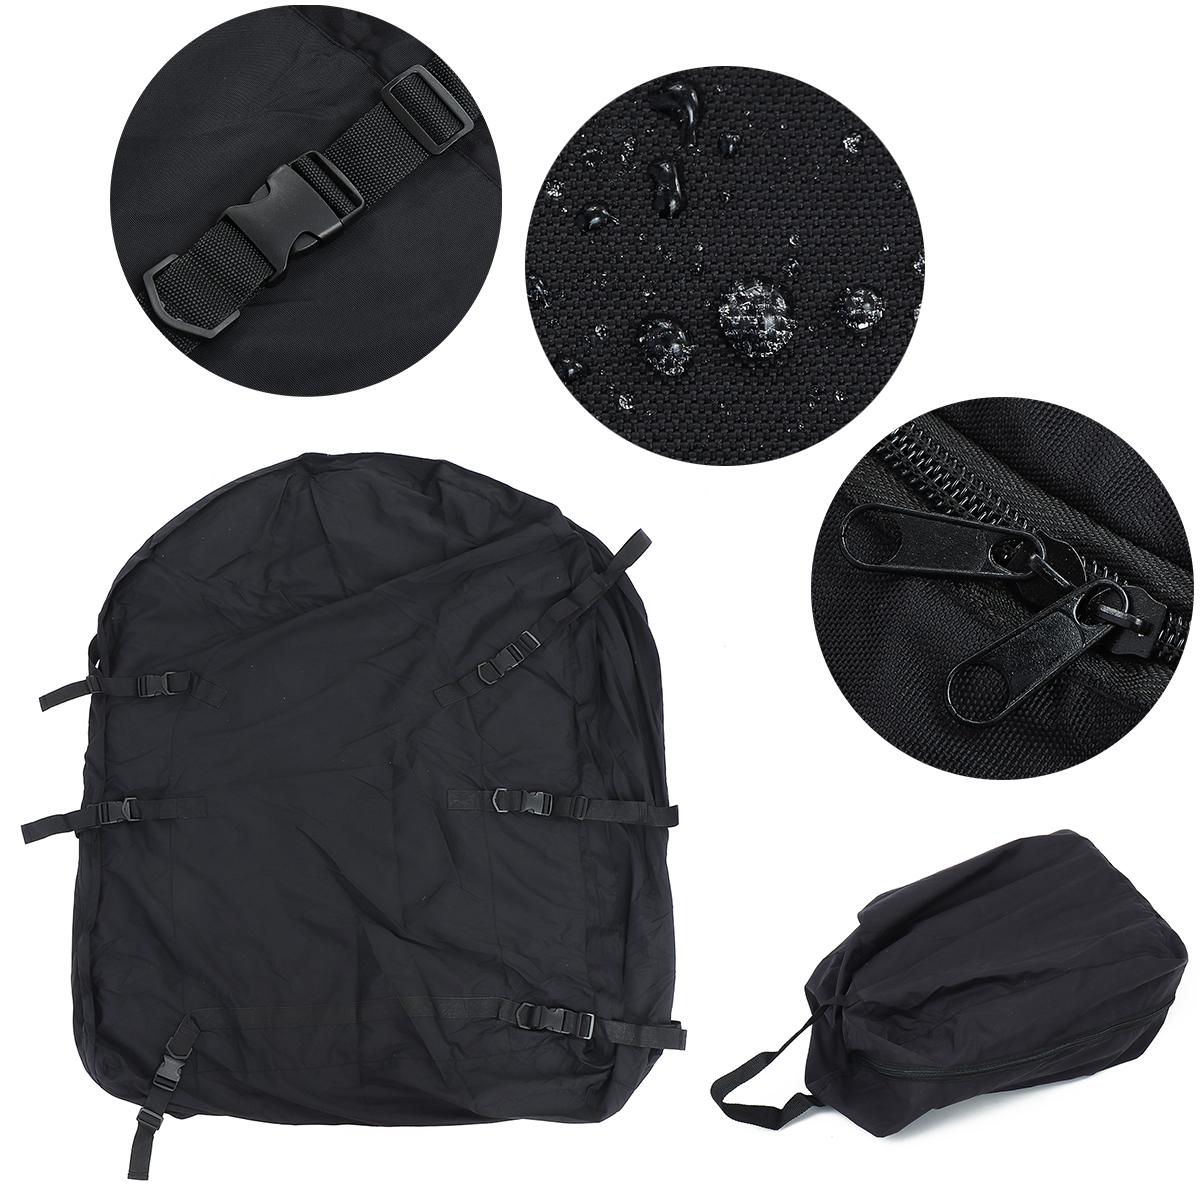 Waterproof Cargo Travel Luggage Bag Basket Car Ro